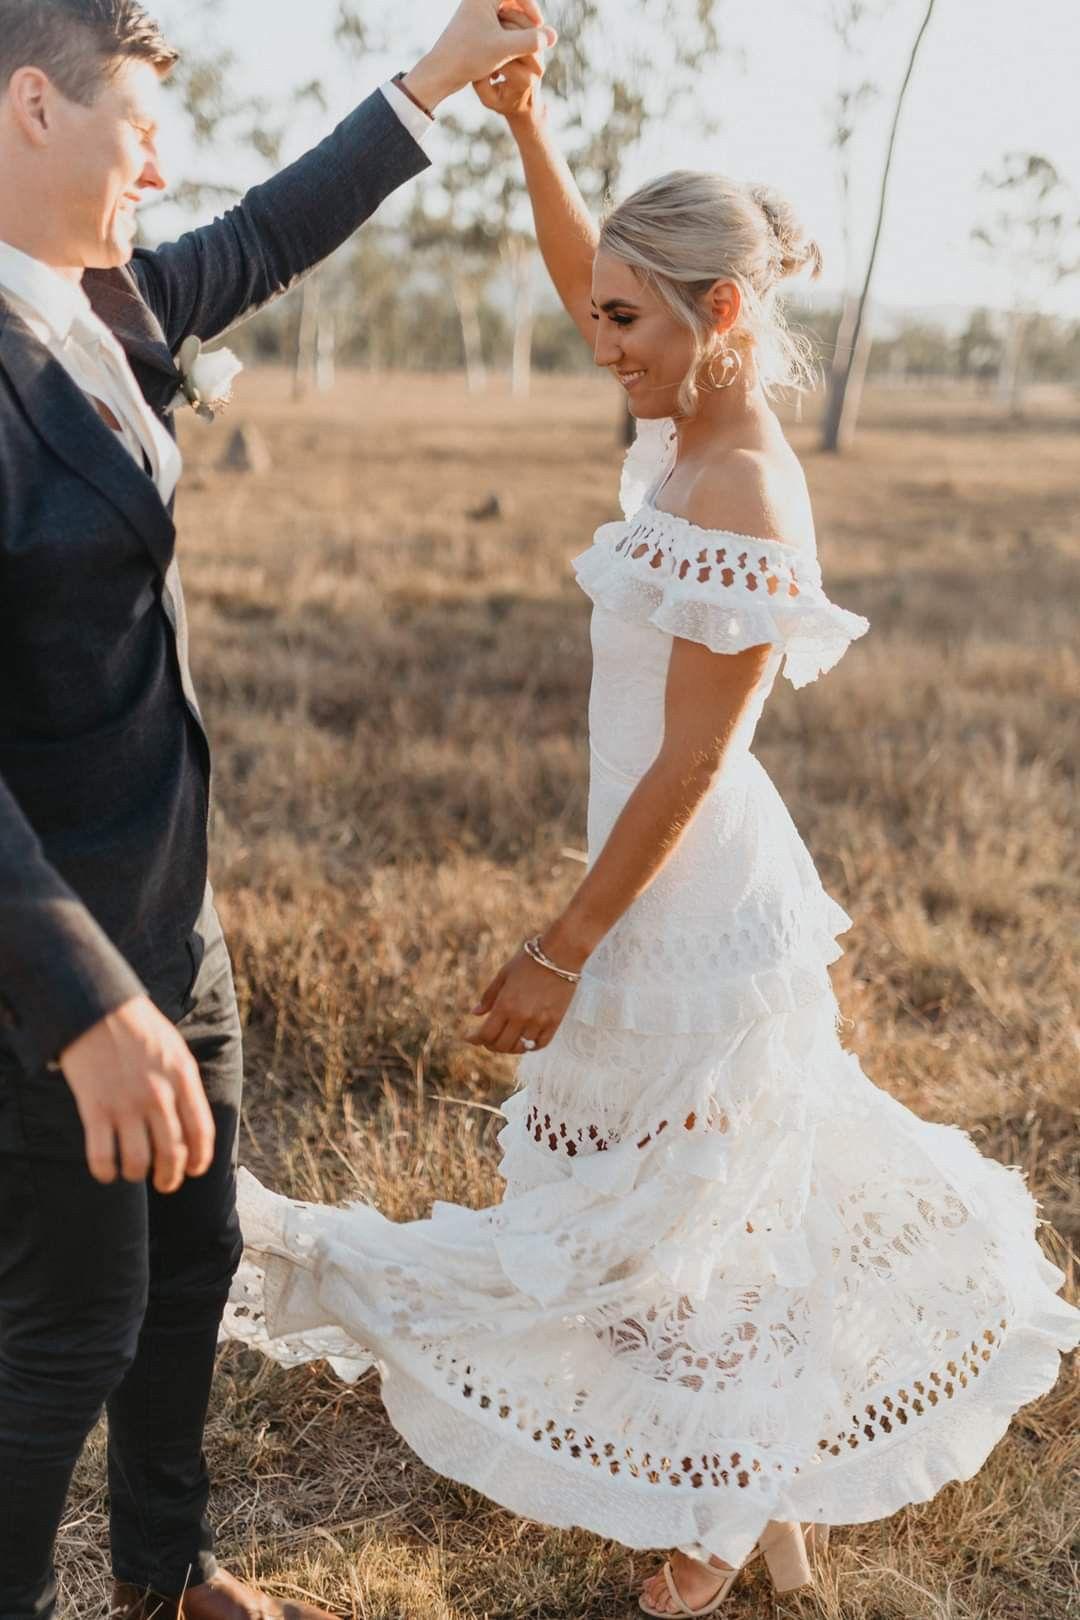 Grace Loves Lace Coco Dress Sample Size S Preowned Wedding Dress Save 38 Grace Loves Lace Preowned Wedding Dresses Coco Dress [ 1620 x 1080 Pixel ]